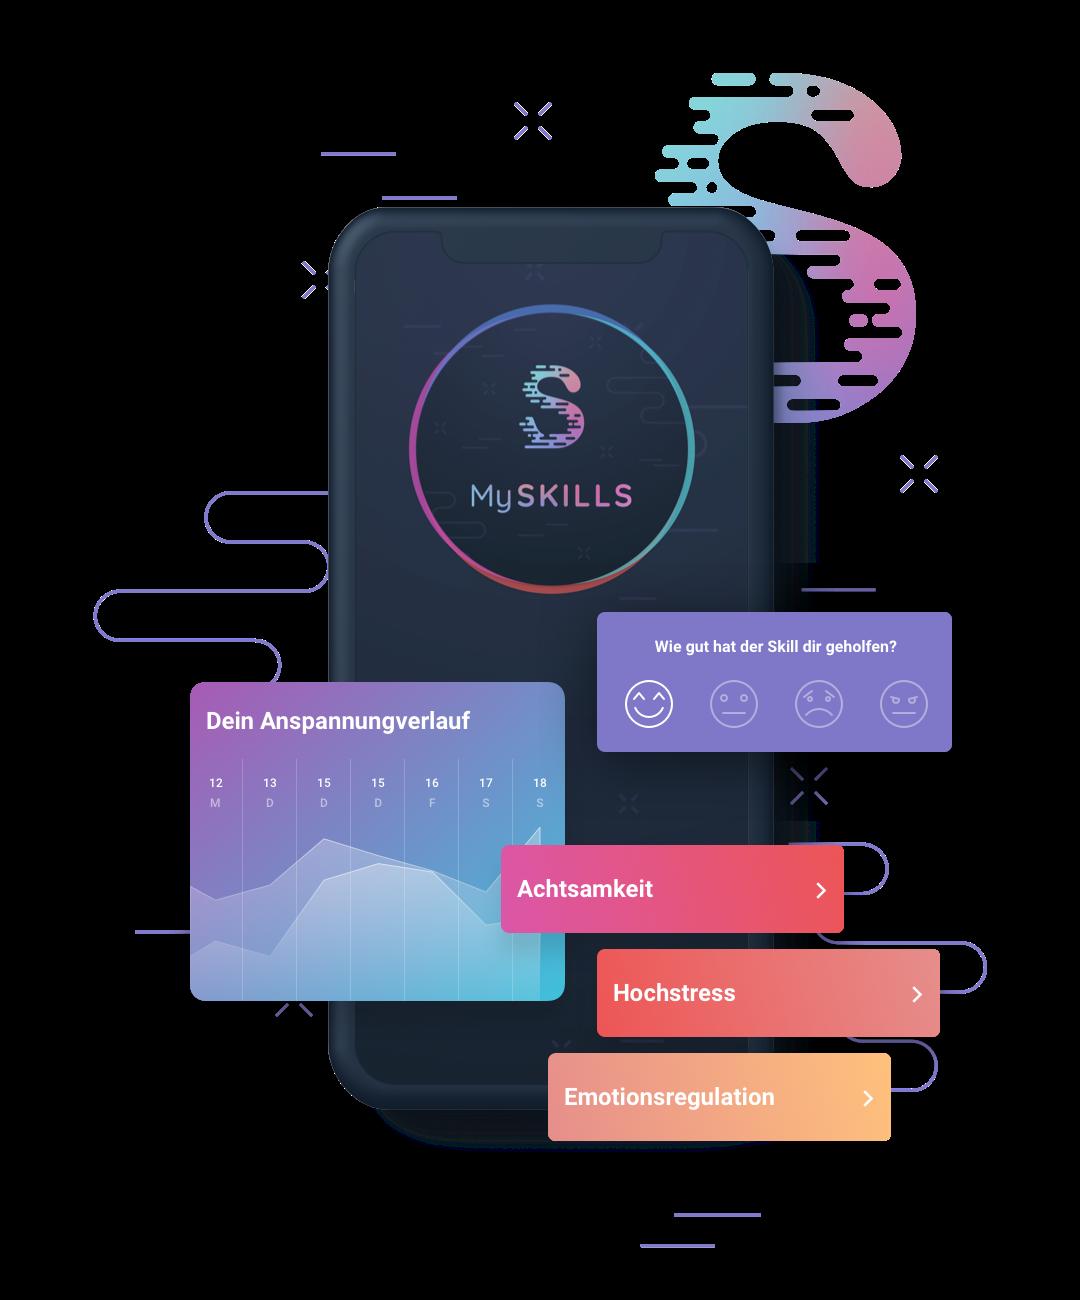 myskills-app-hero-image-features